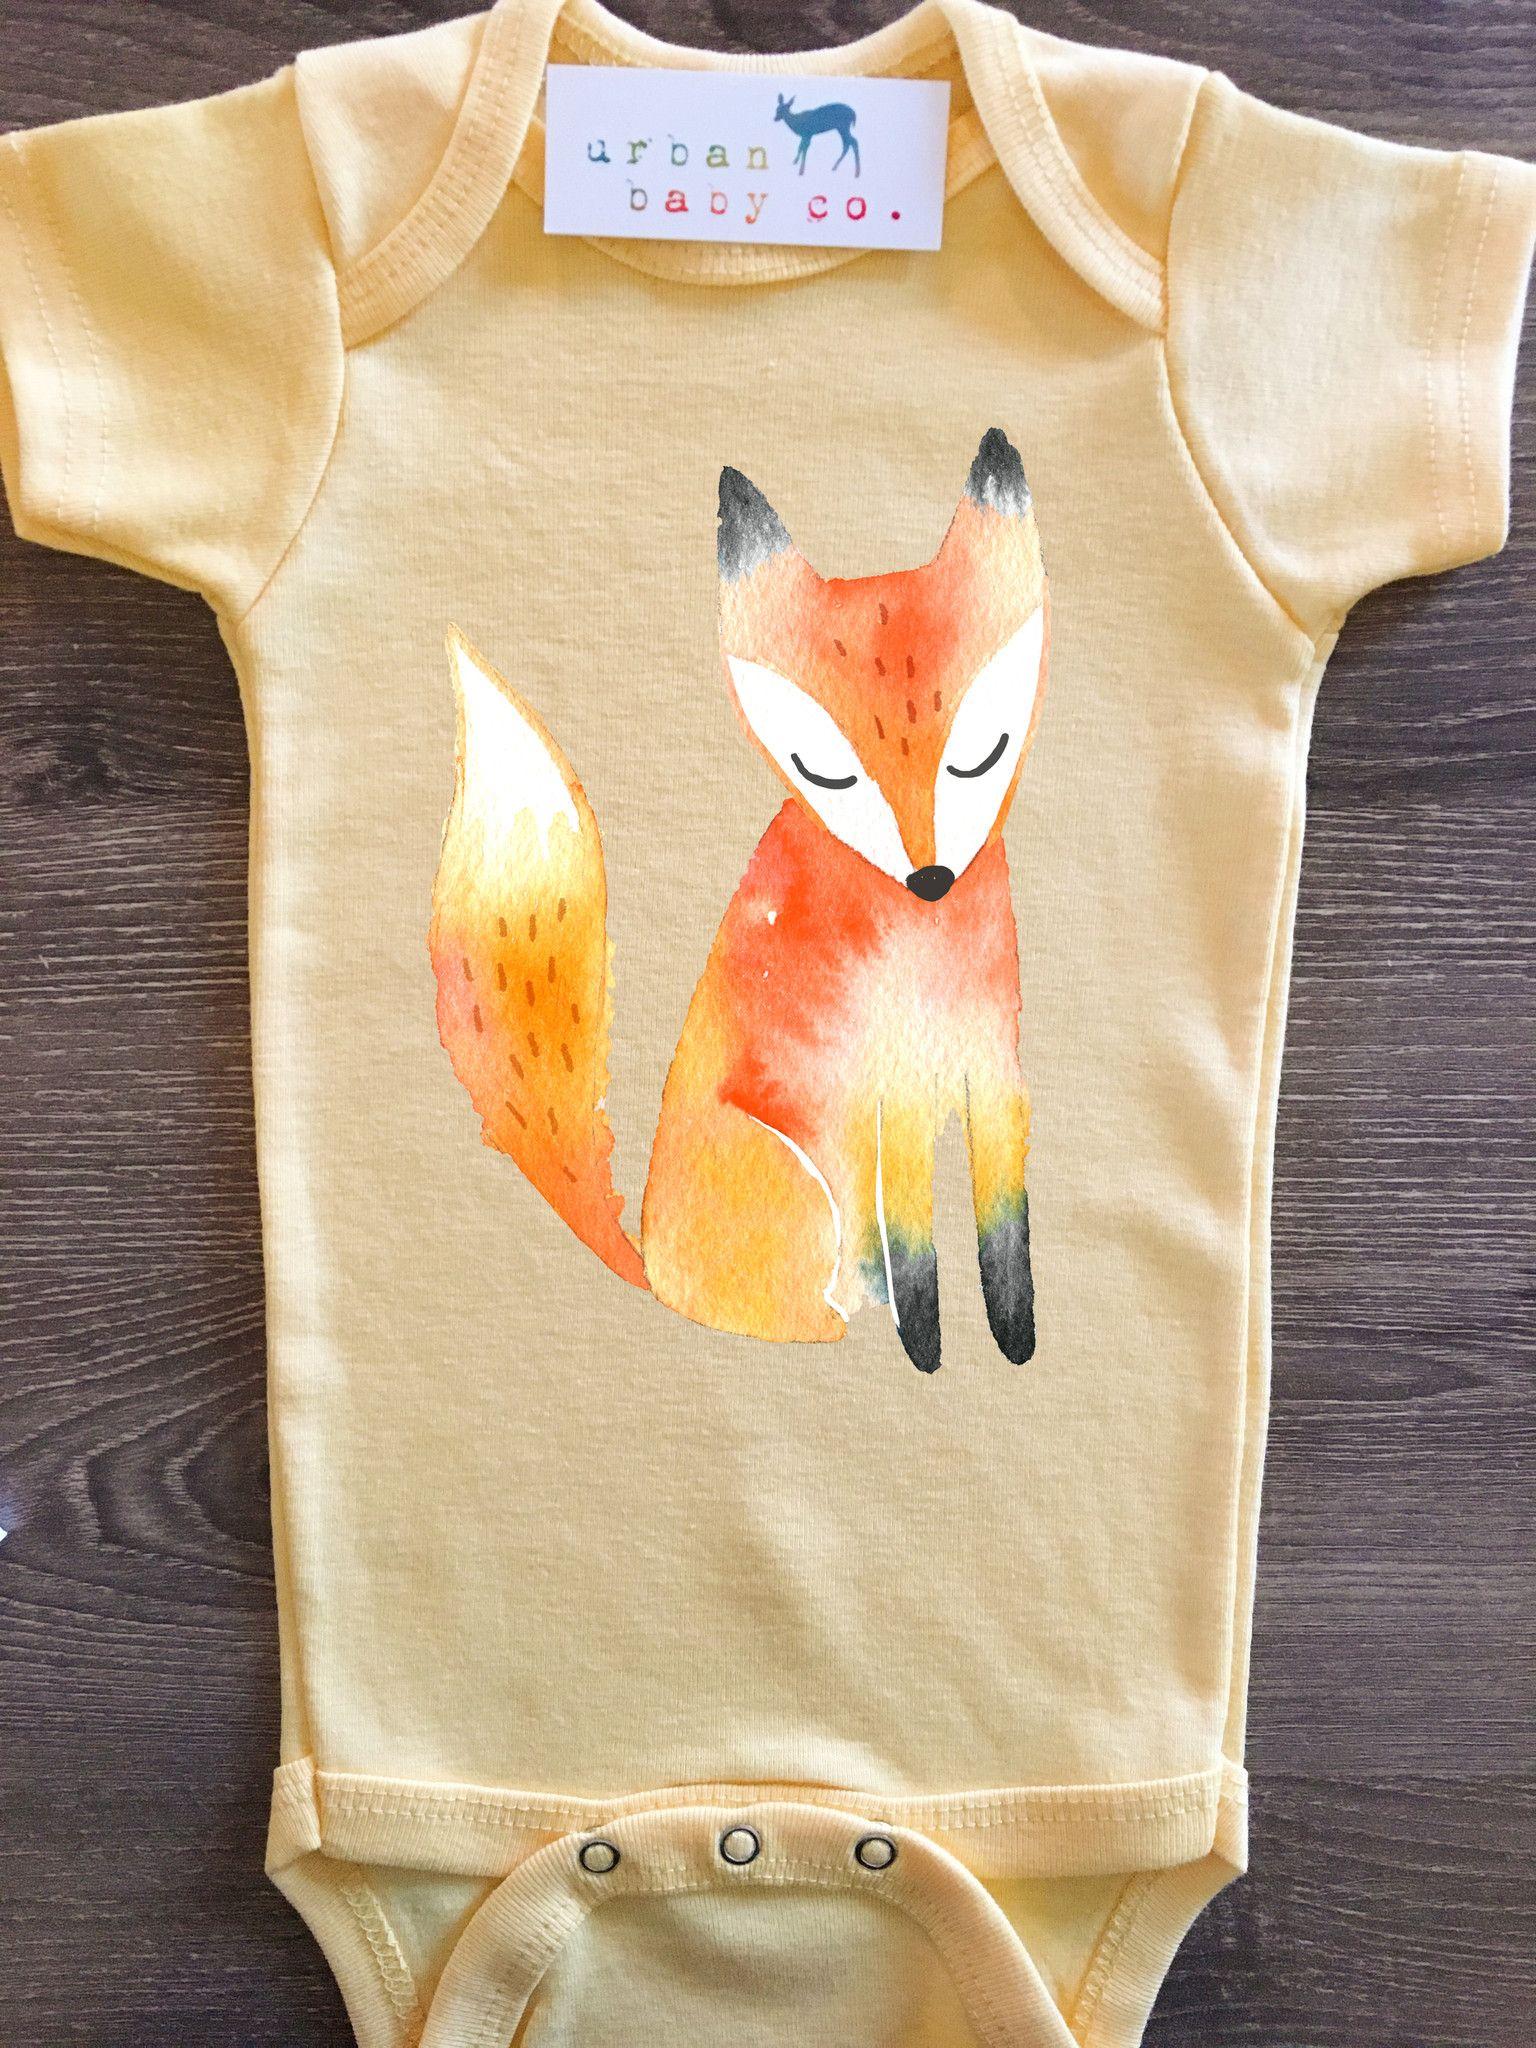 Fox Baby Boy Girl Uni Gender Neutral Infant Toddler